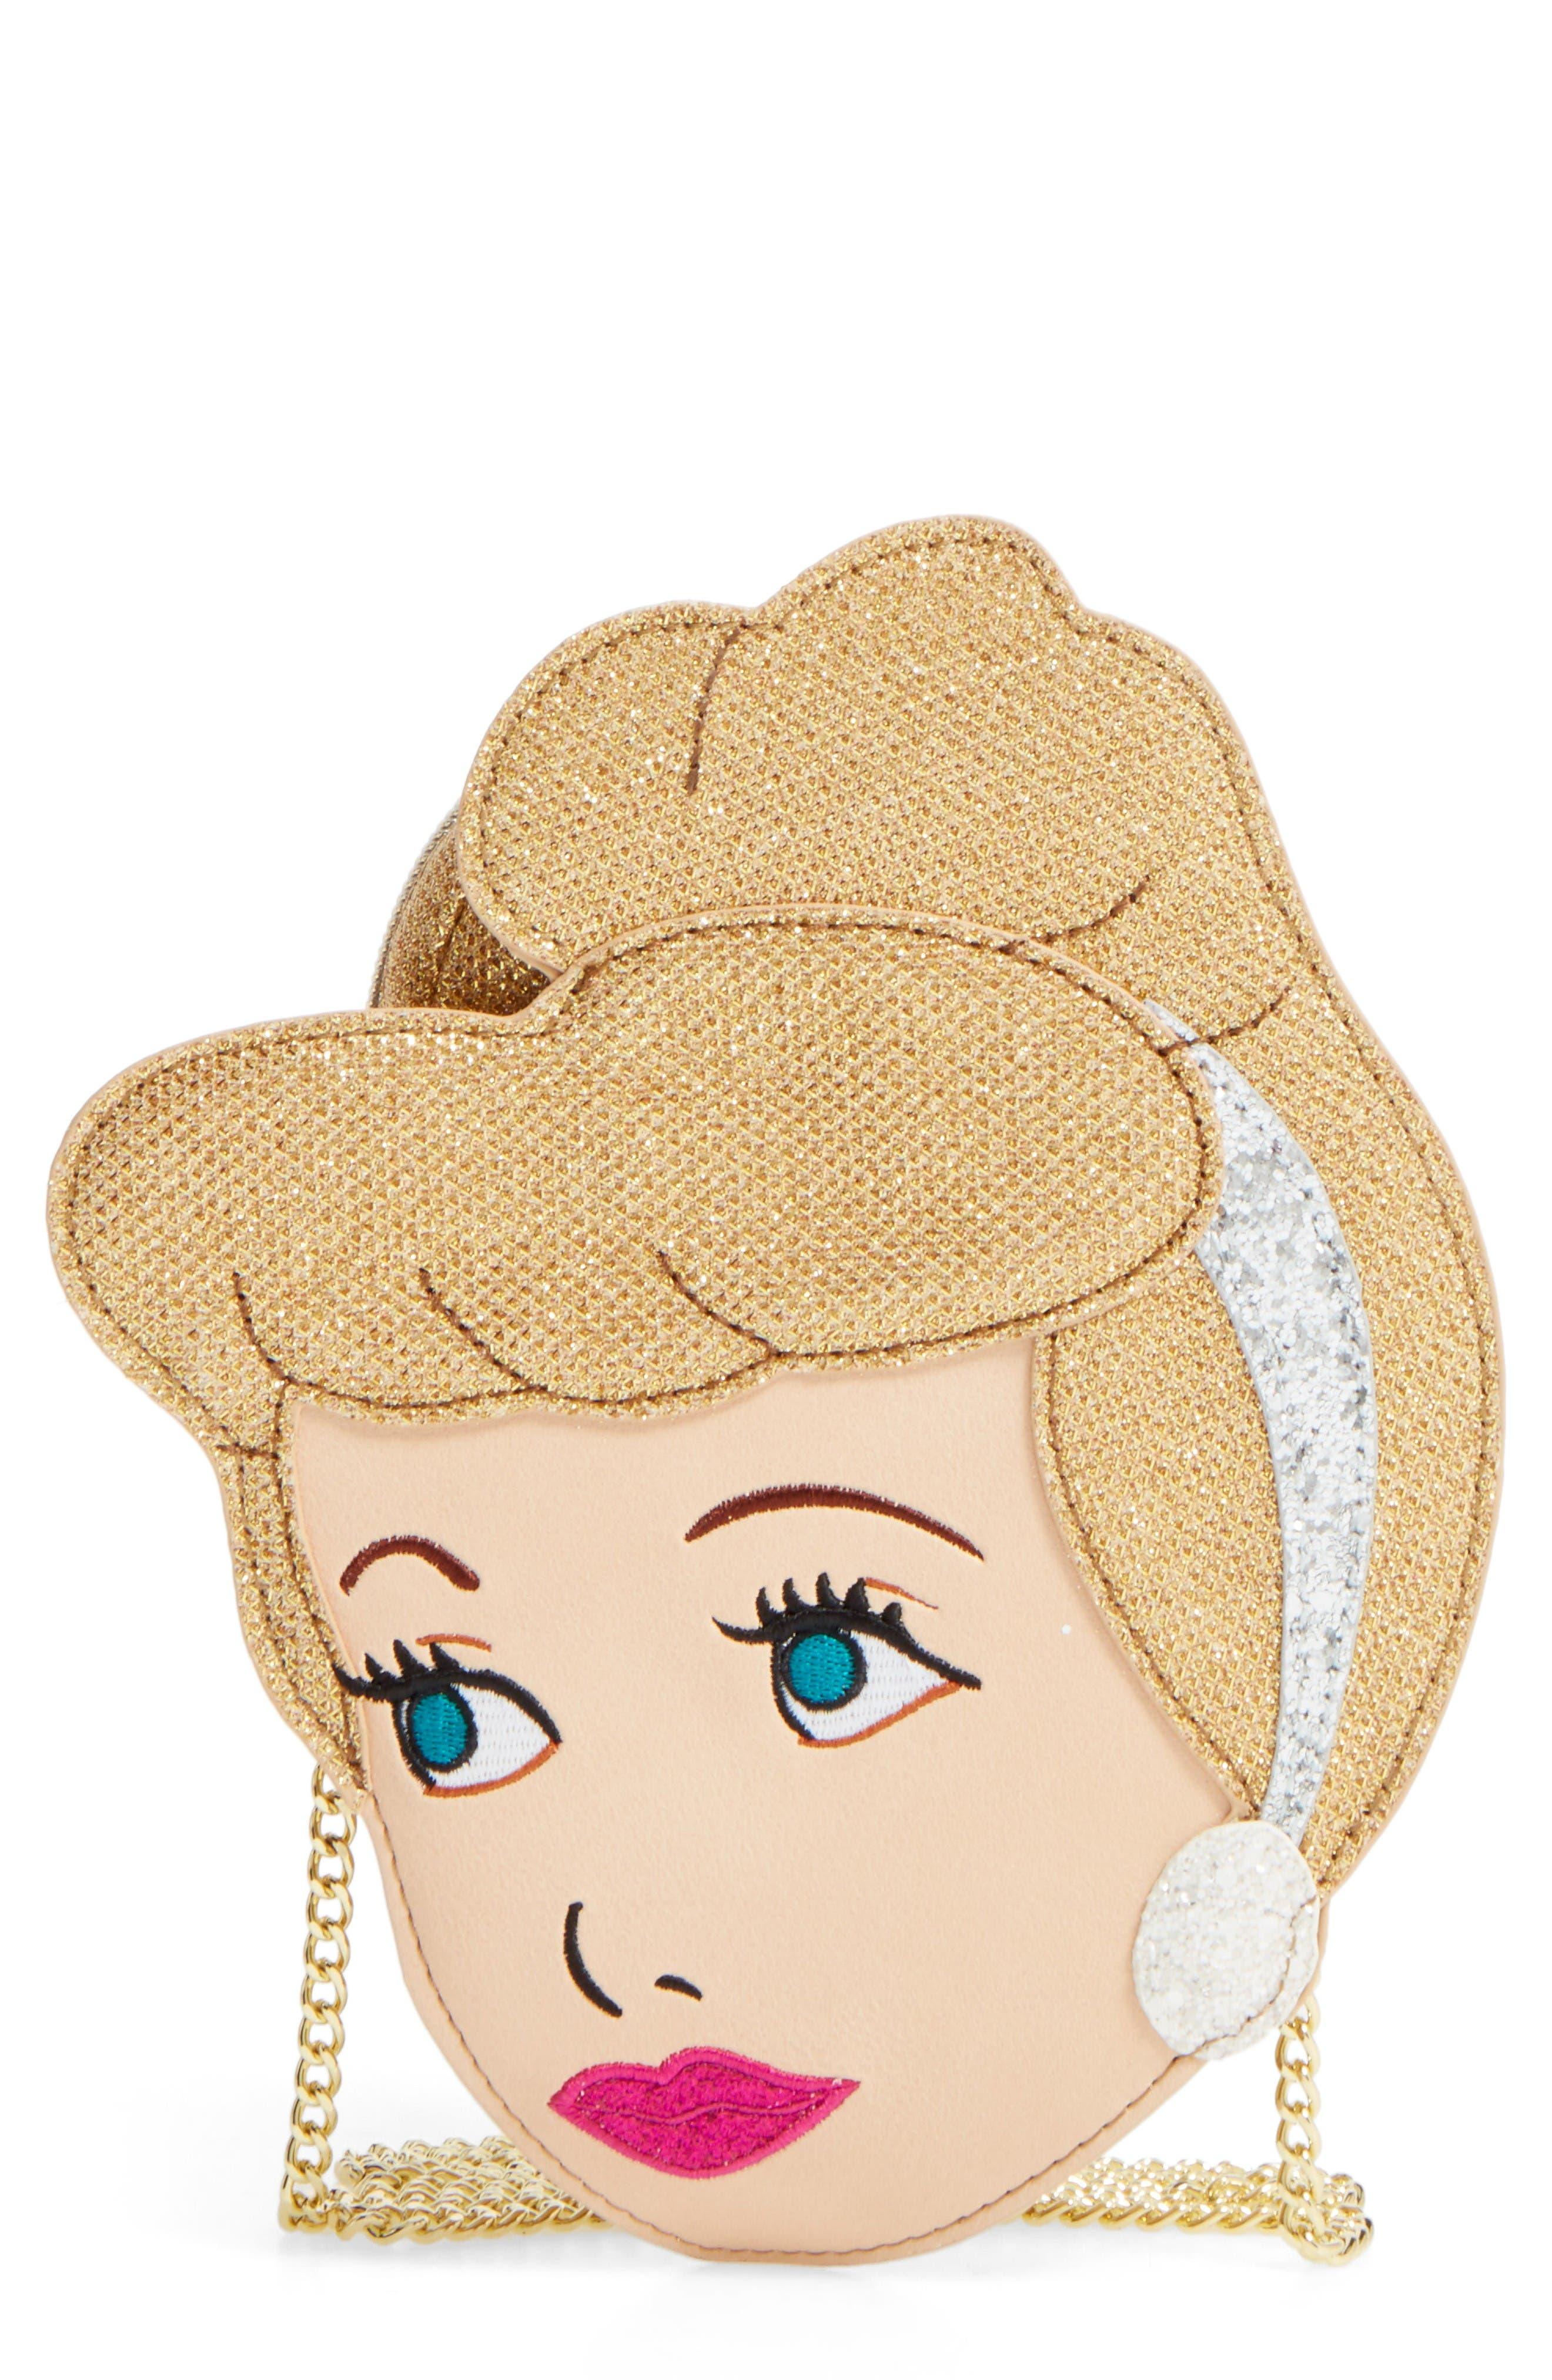 x Disney<sup>®</sup> Cinderella Crossbody Bag,                         Main,                         color, Beige